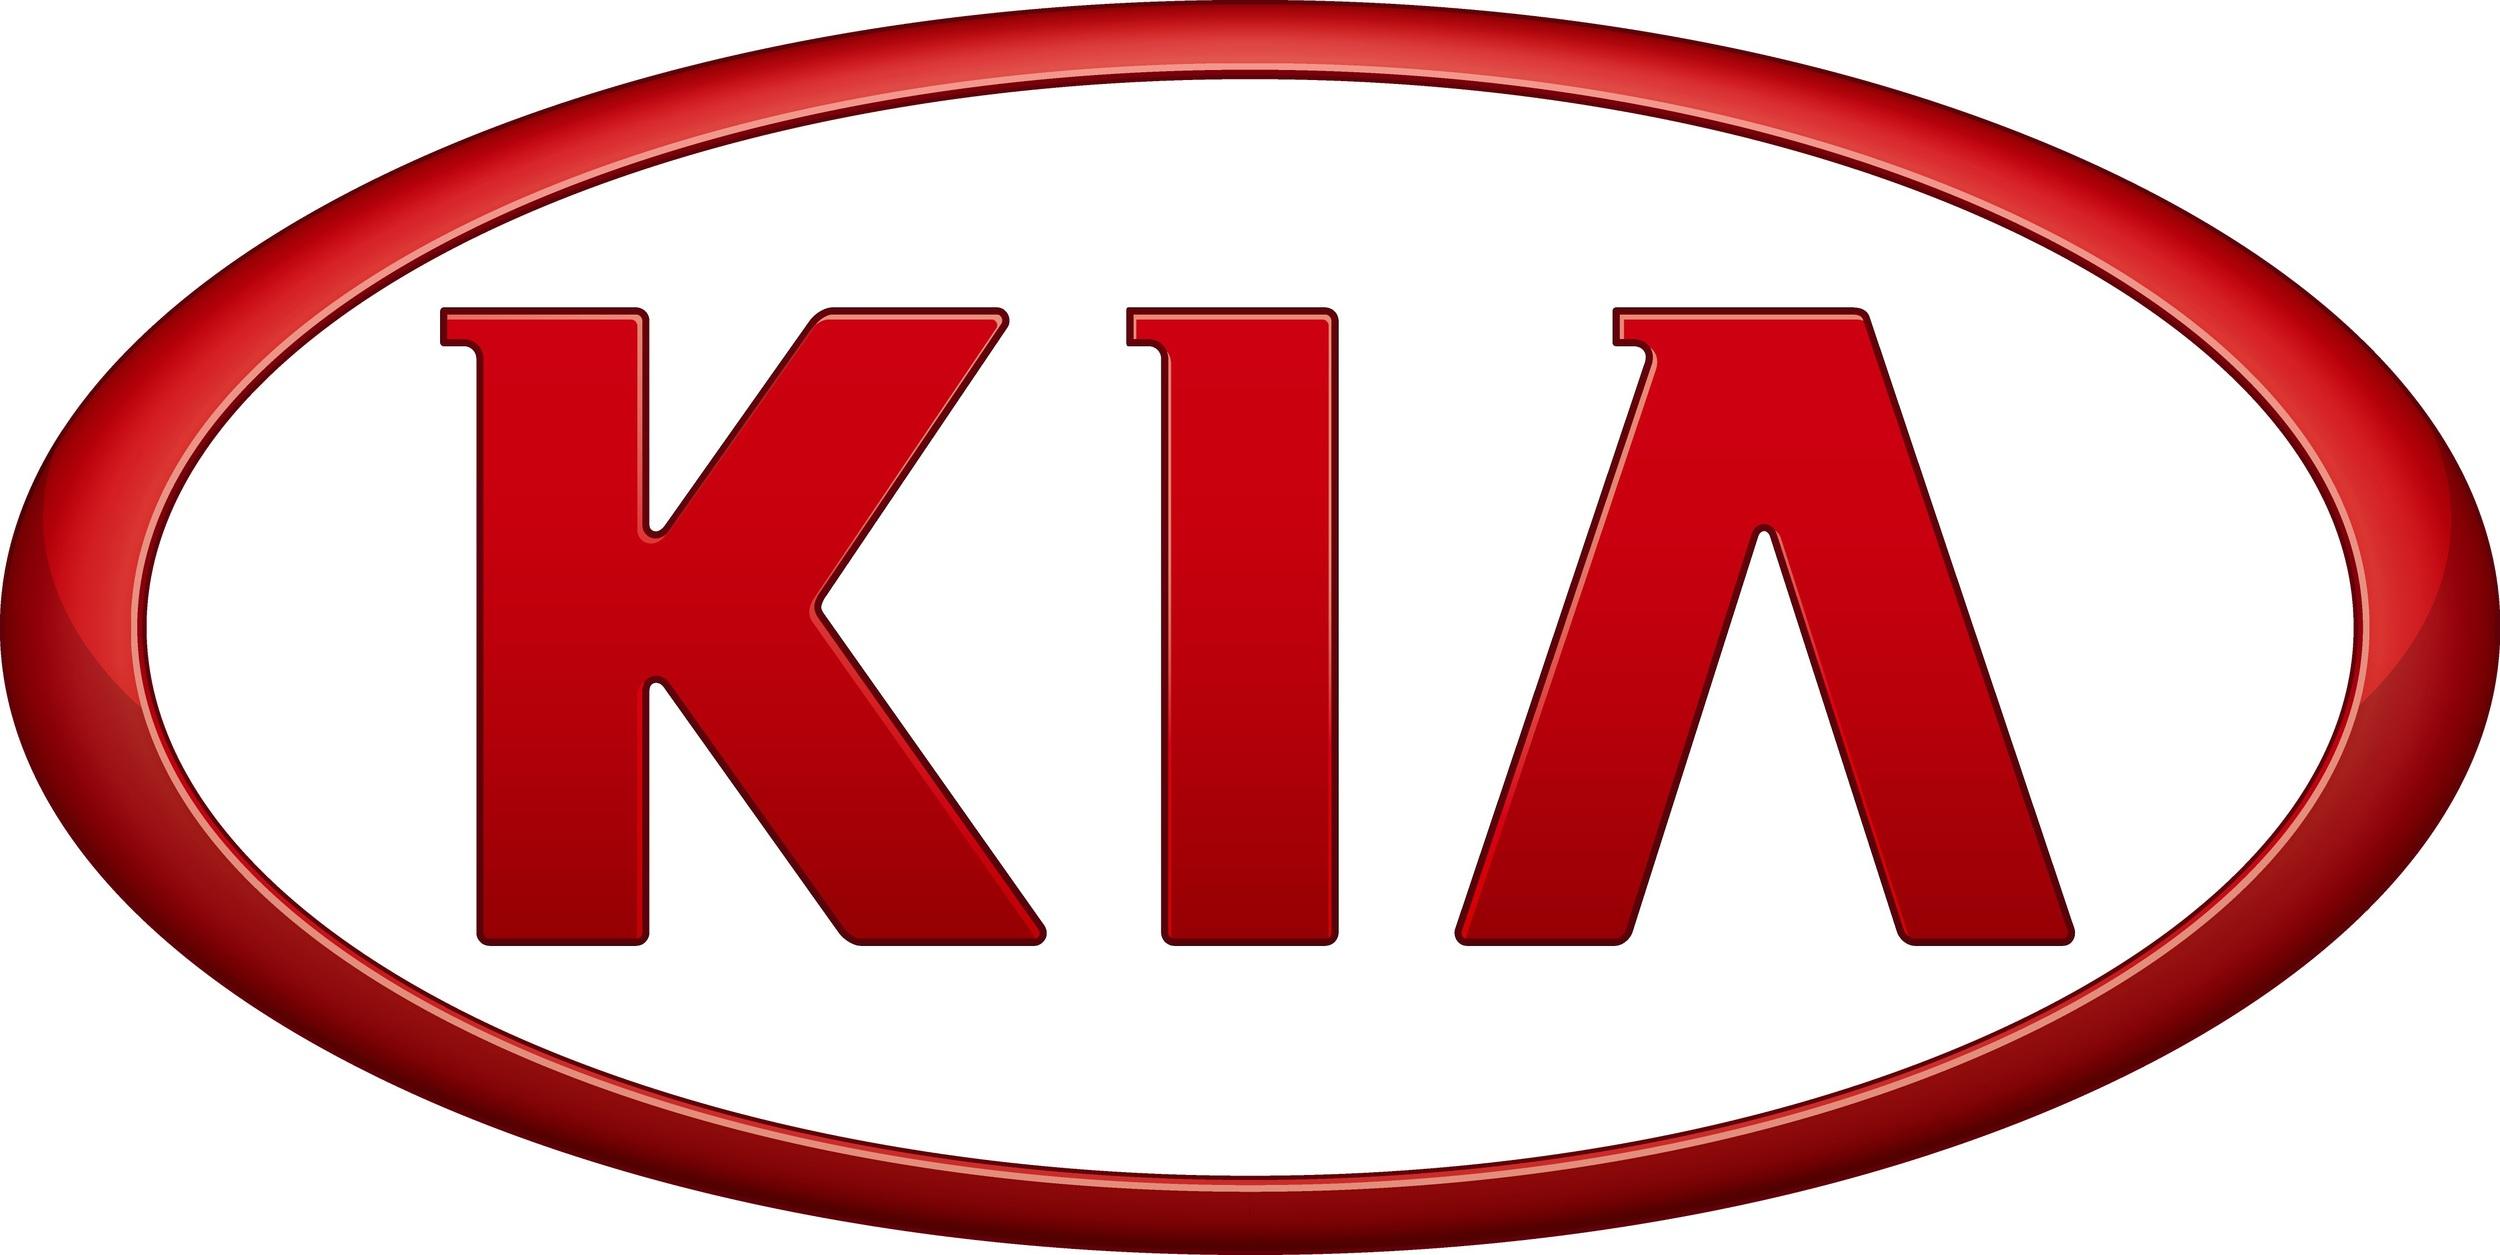 Kia Exemplar Vehicles